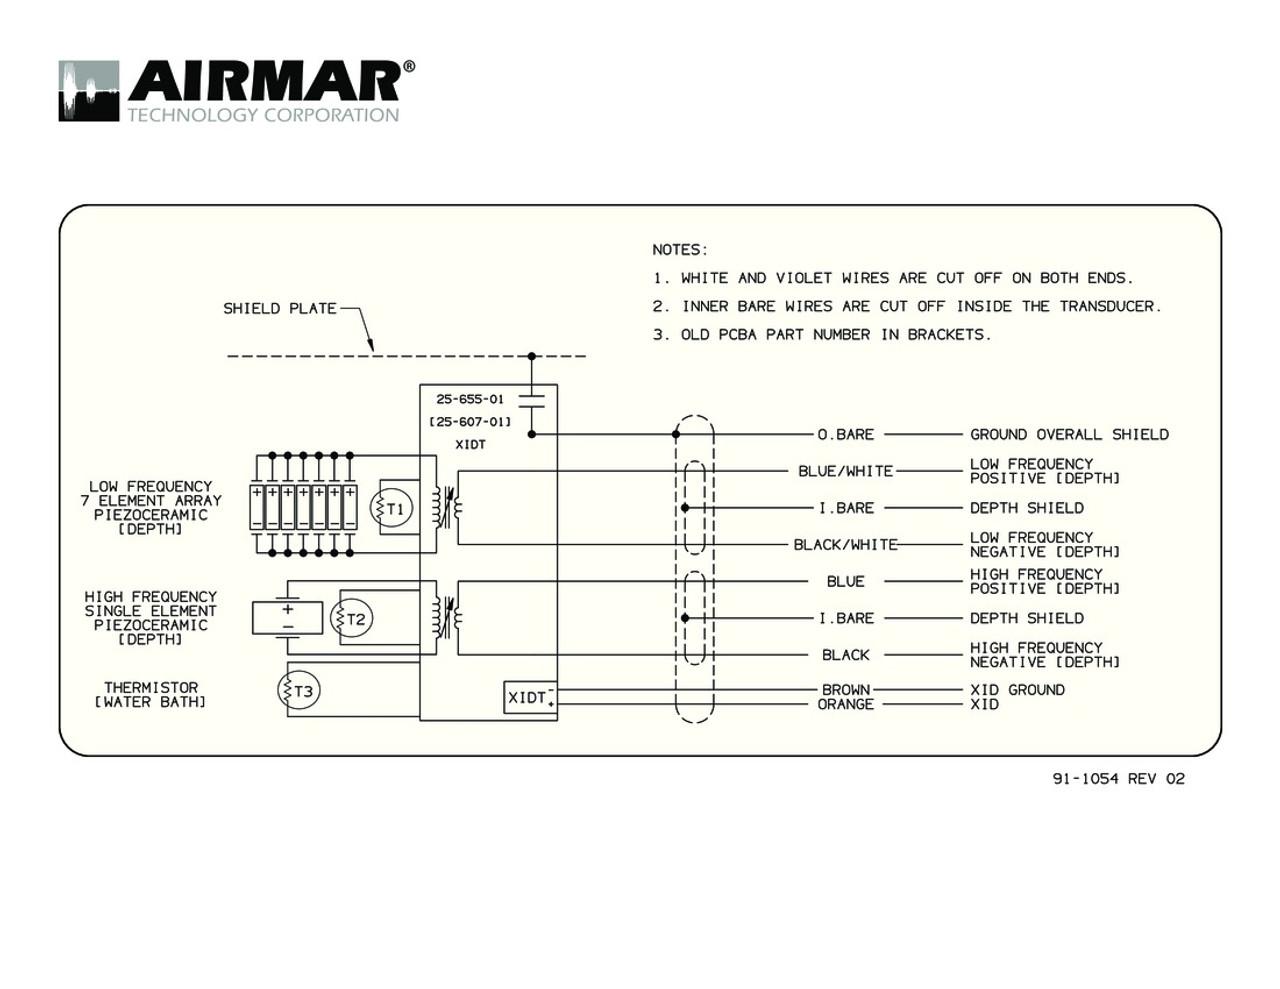 WRG-3991] Humminbird Transducer Wiring Diagram on